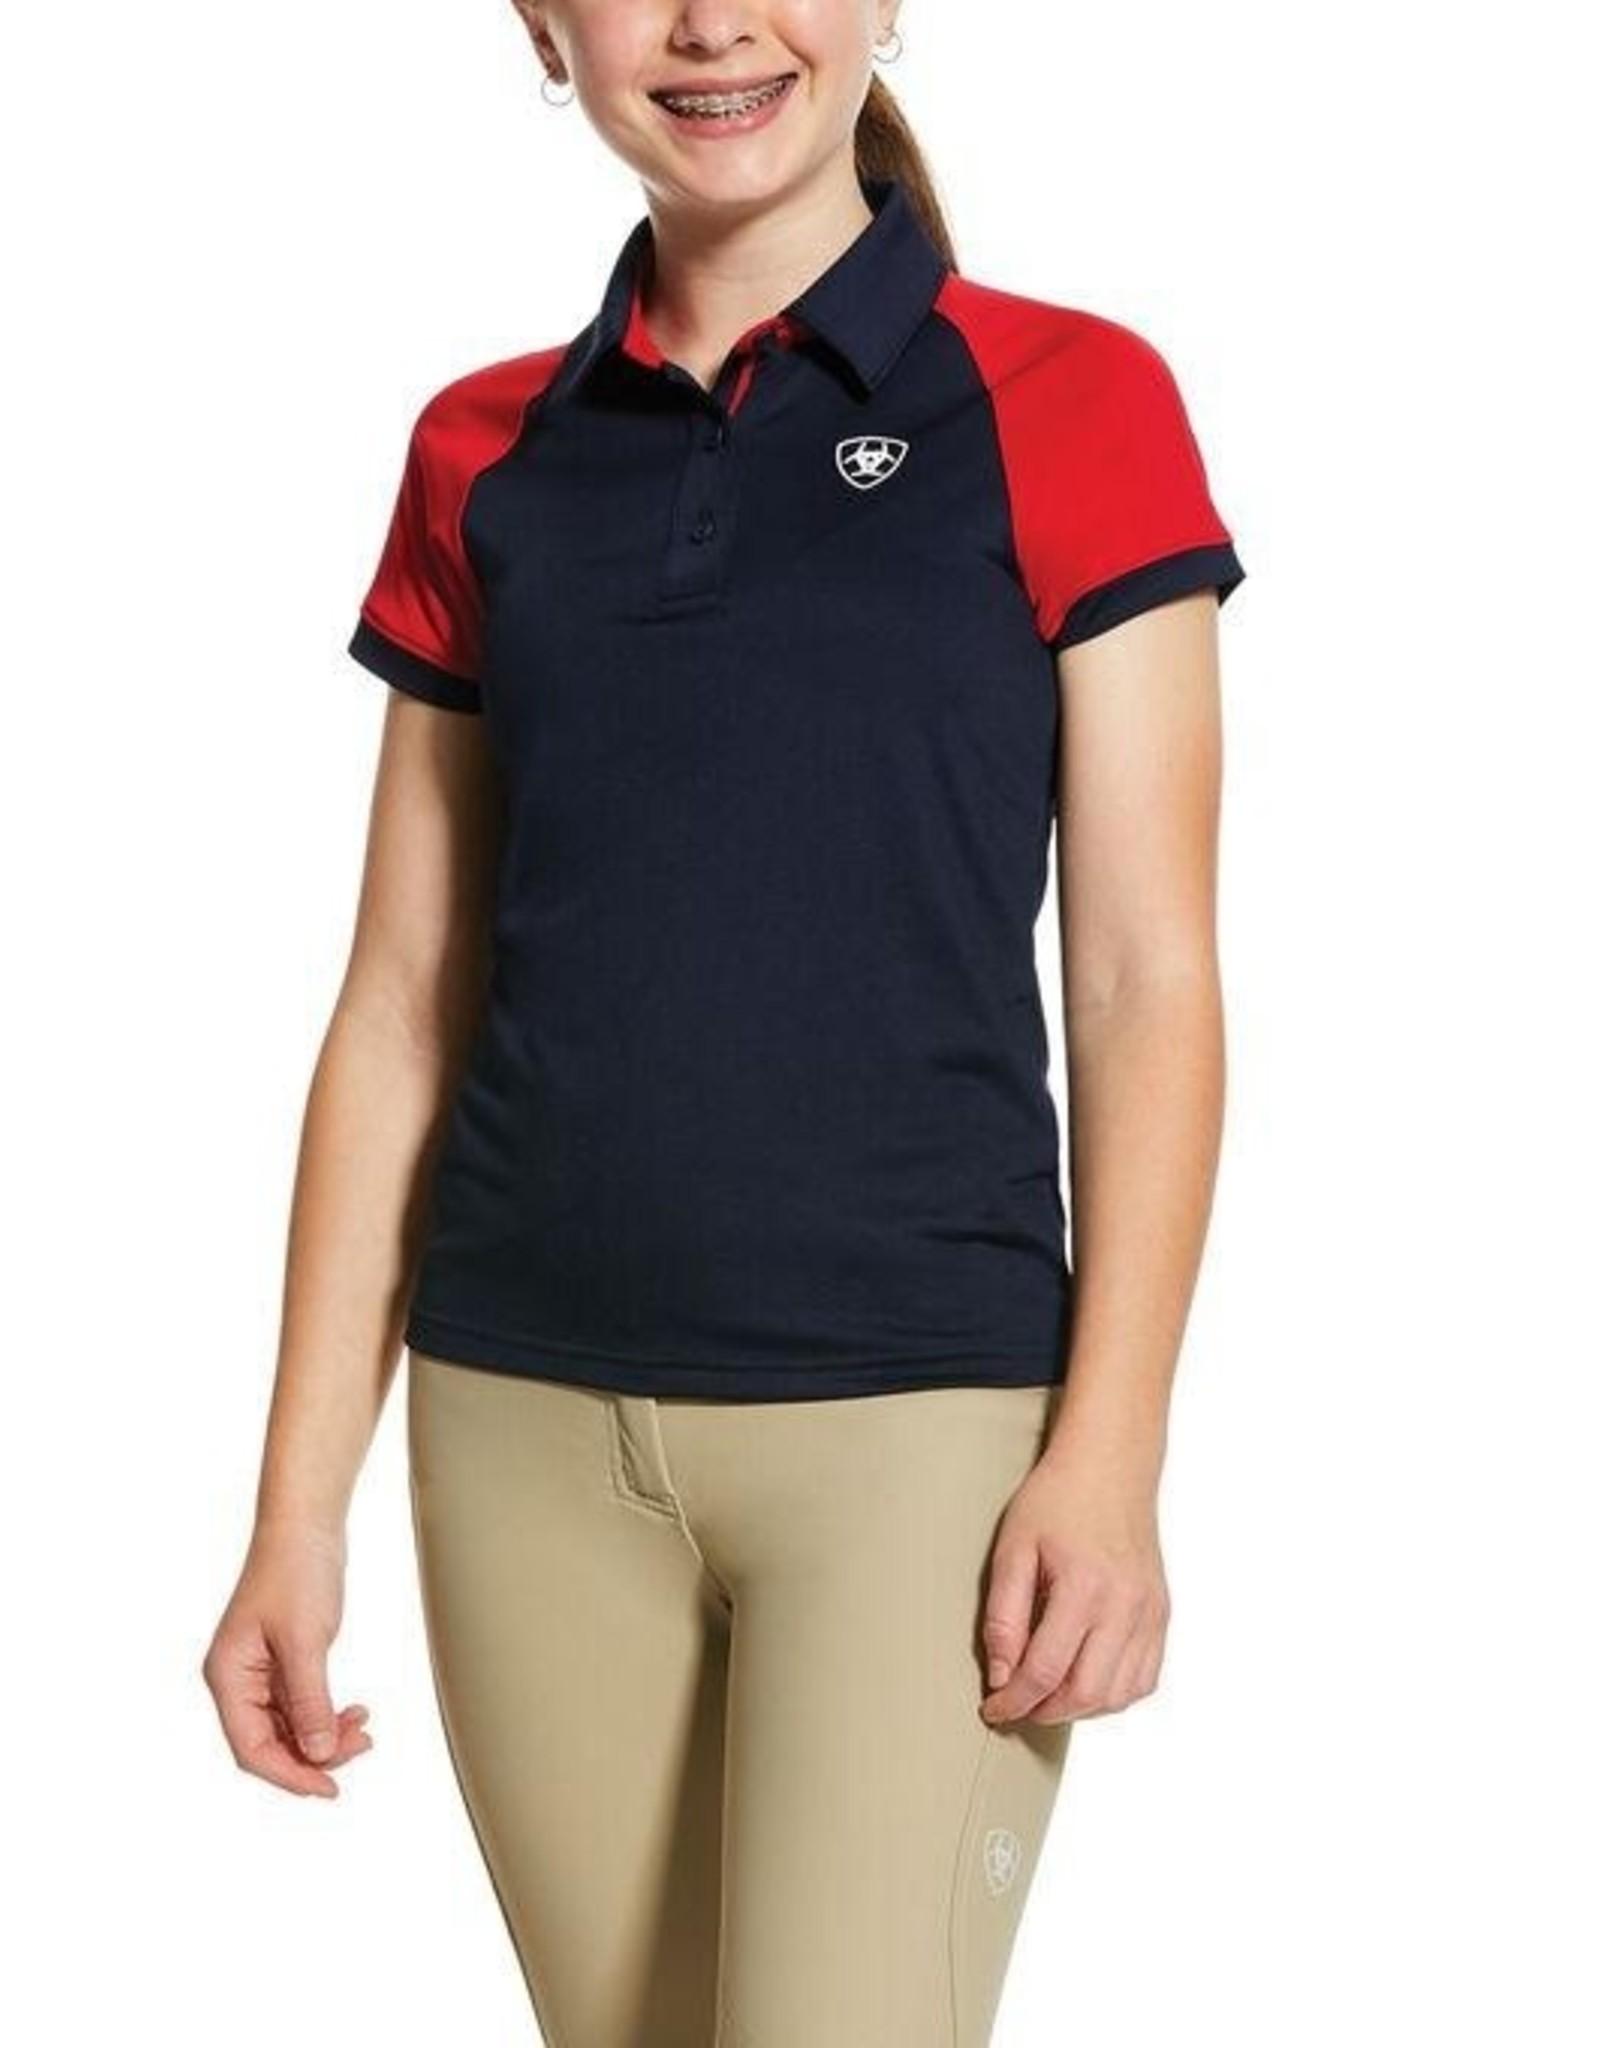 Ariat Kids' Team 3.0 Polo Shirt